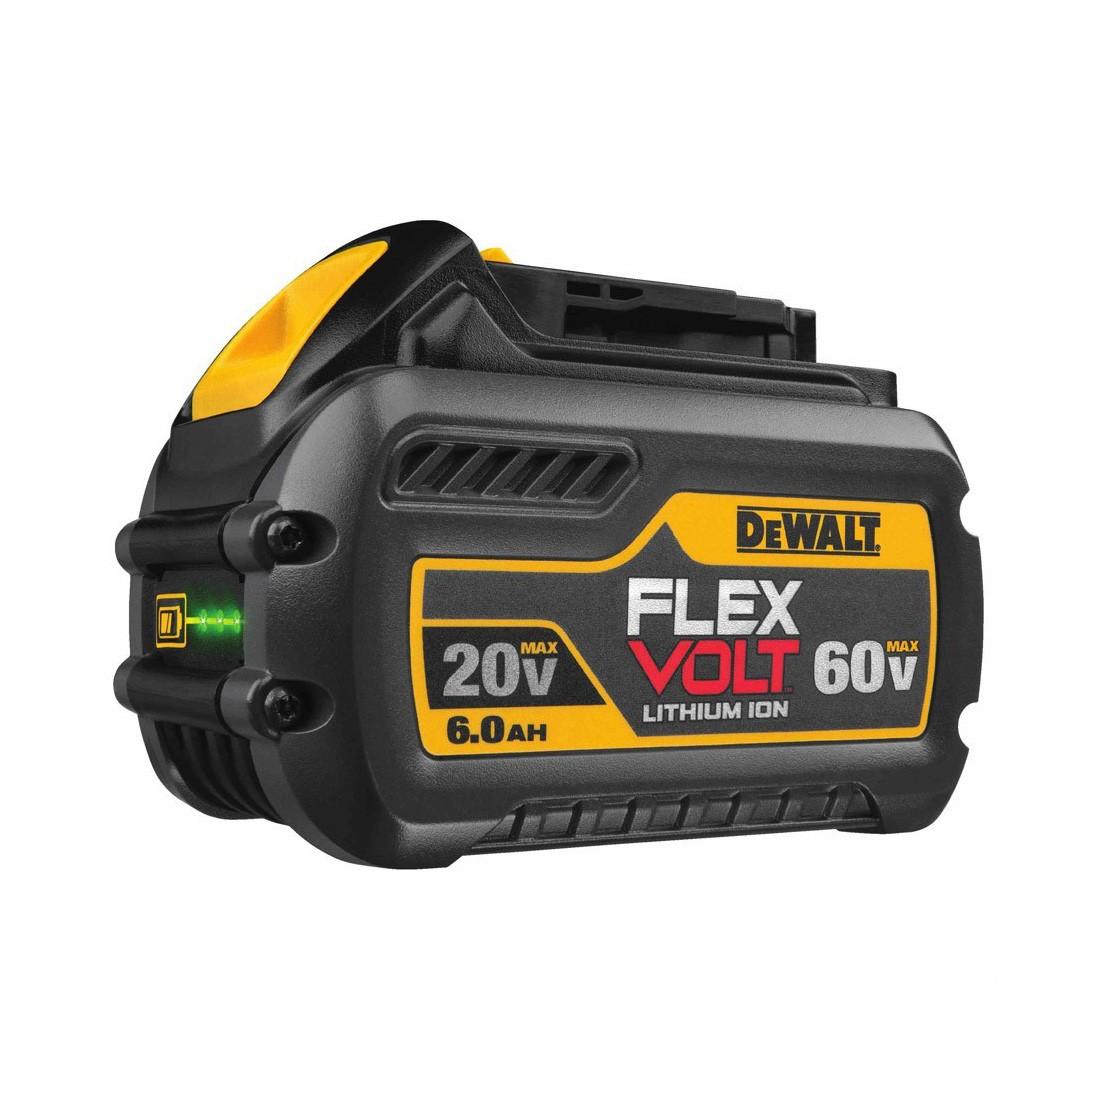 Bateria 20V/60V FlexVolt LI-ION 6Ah - Dewalt